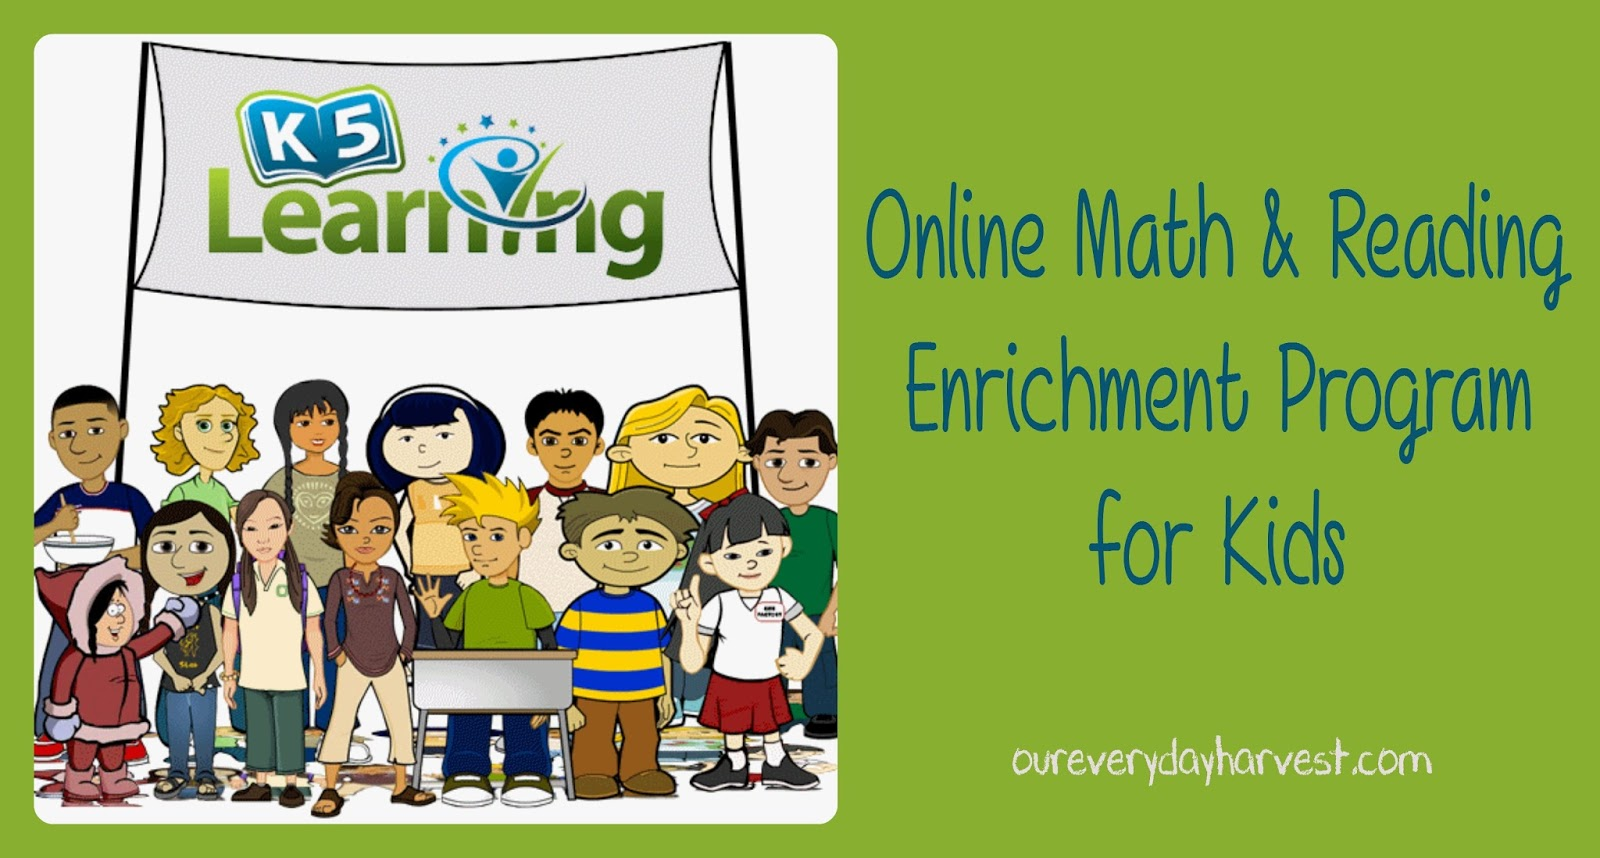 Online Math And Reading Enrichment Program For Kids K5